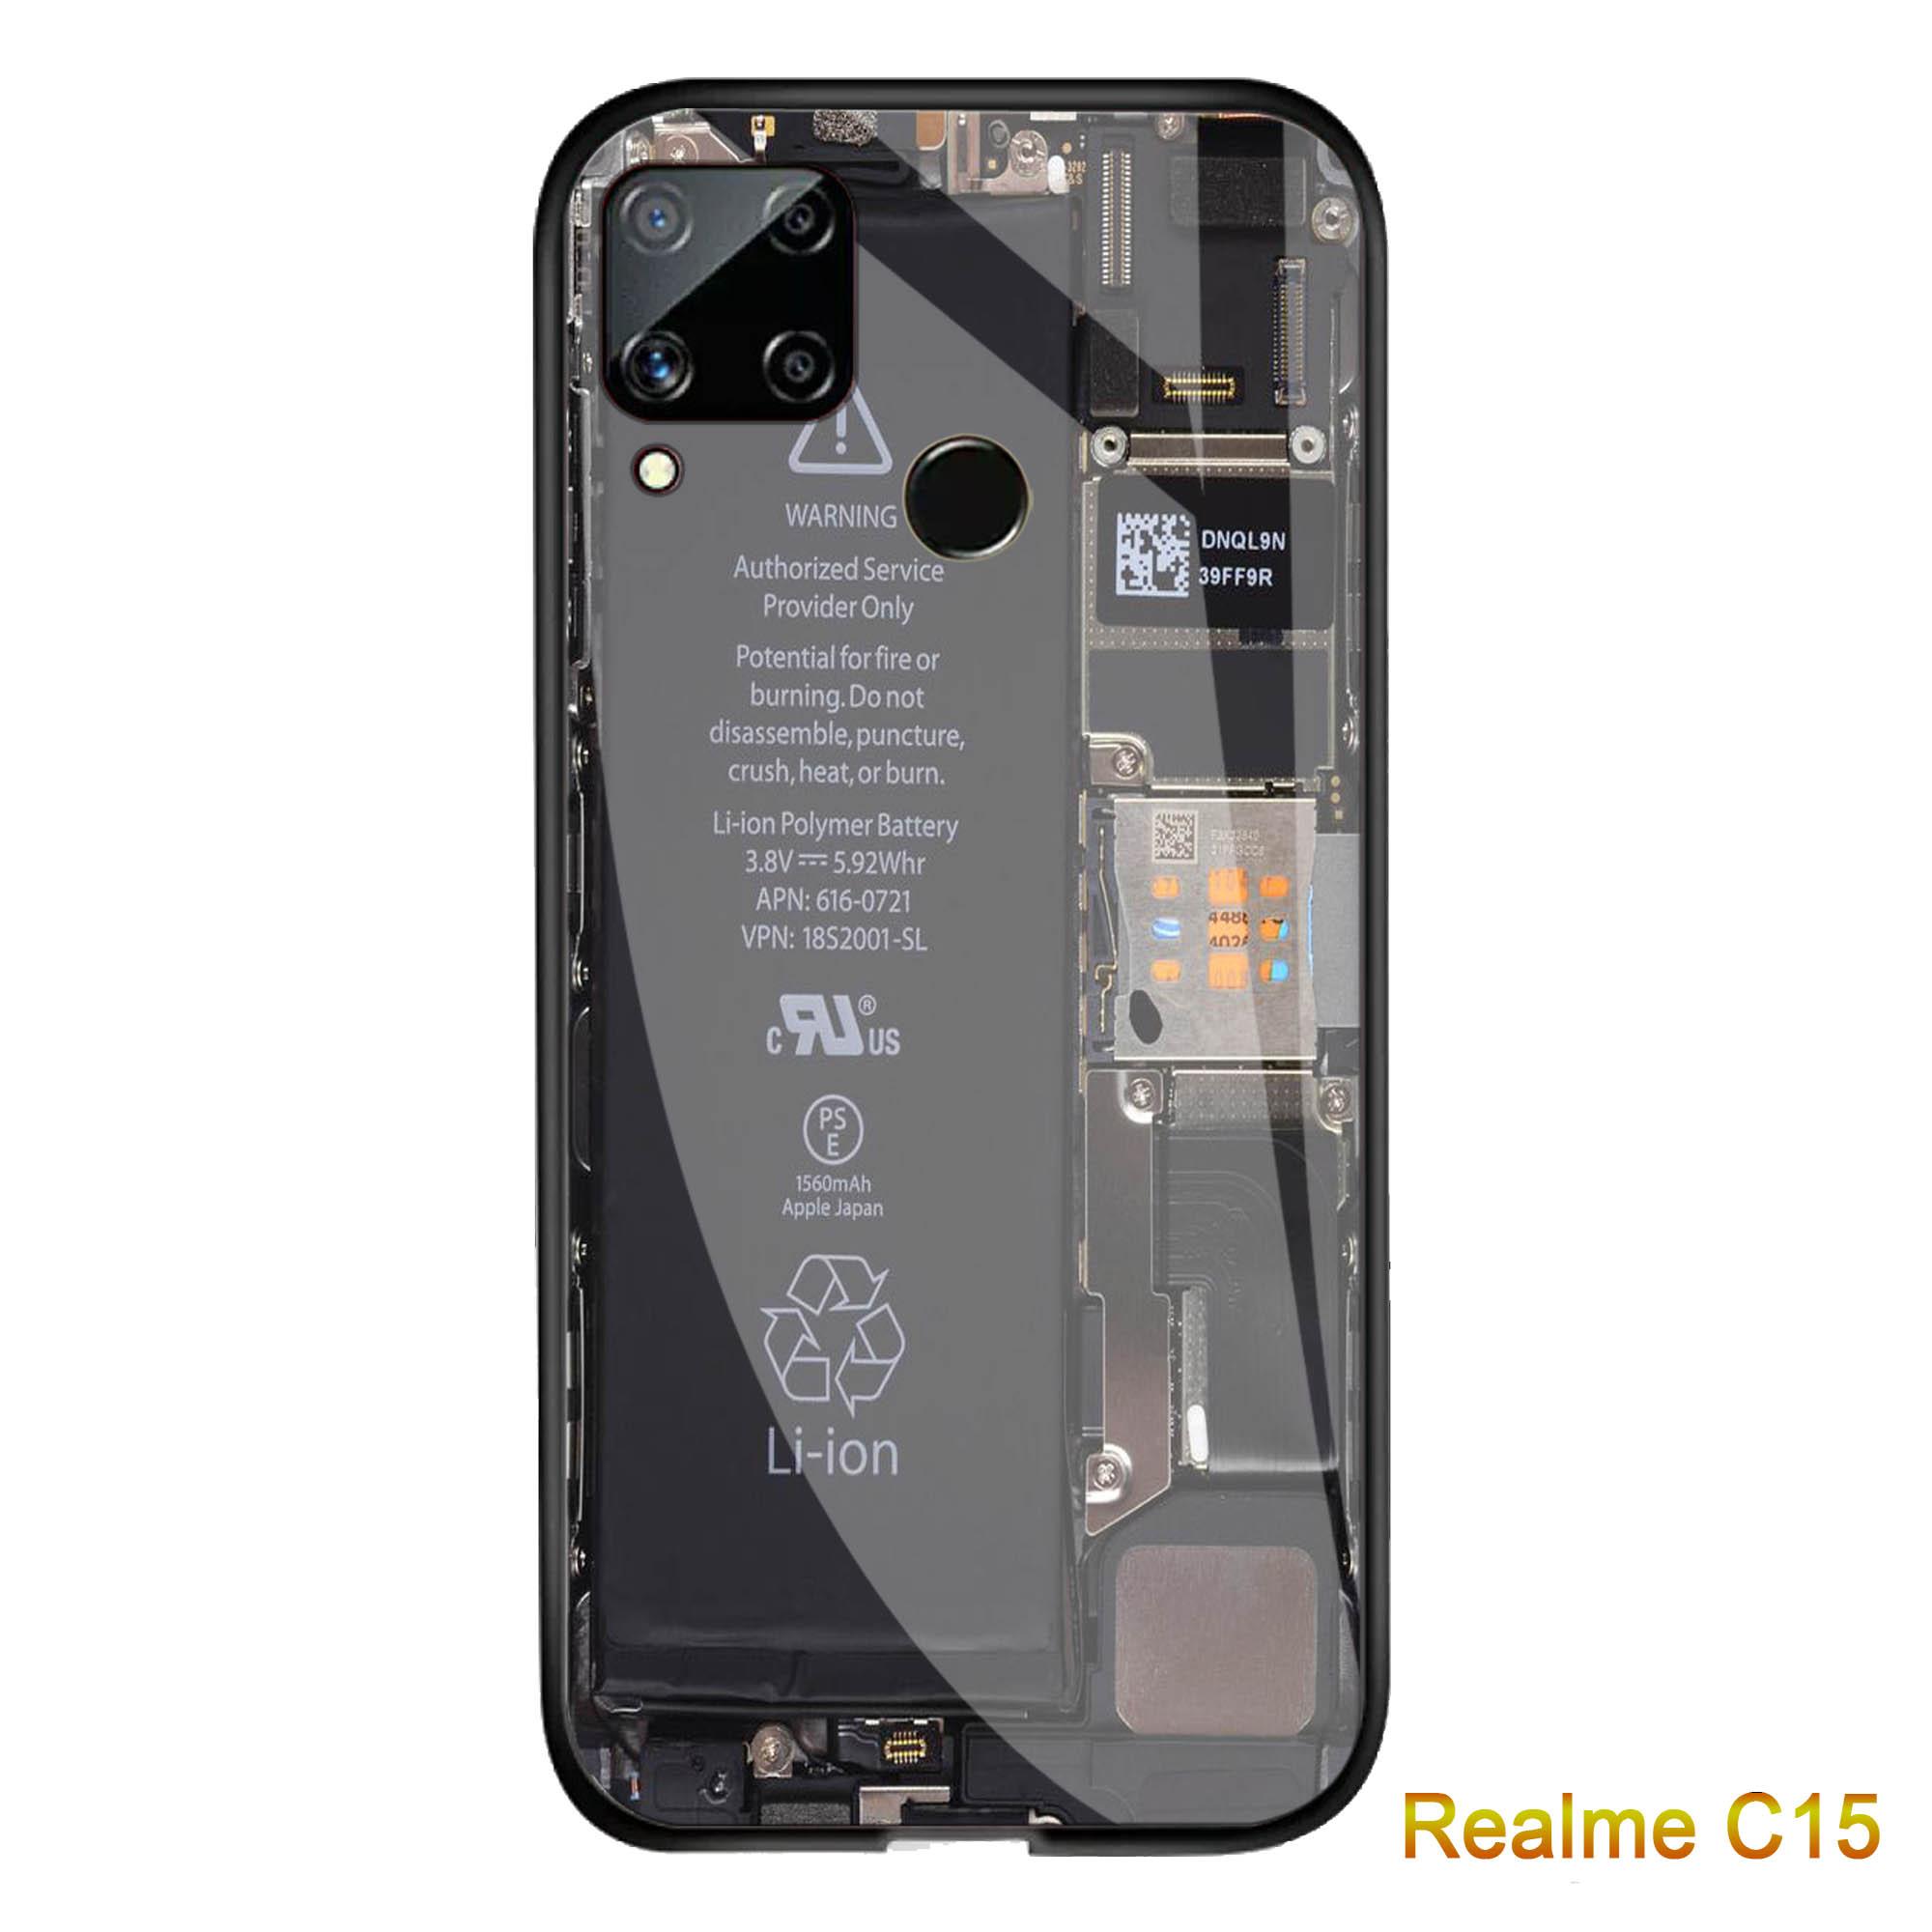 softcase glass kaca samsung a11 m11 – j14 – casing hp-pelindung hp-case handphone